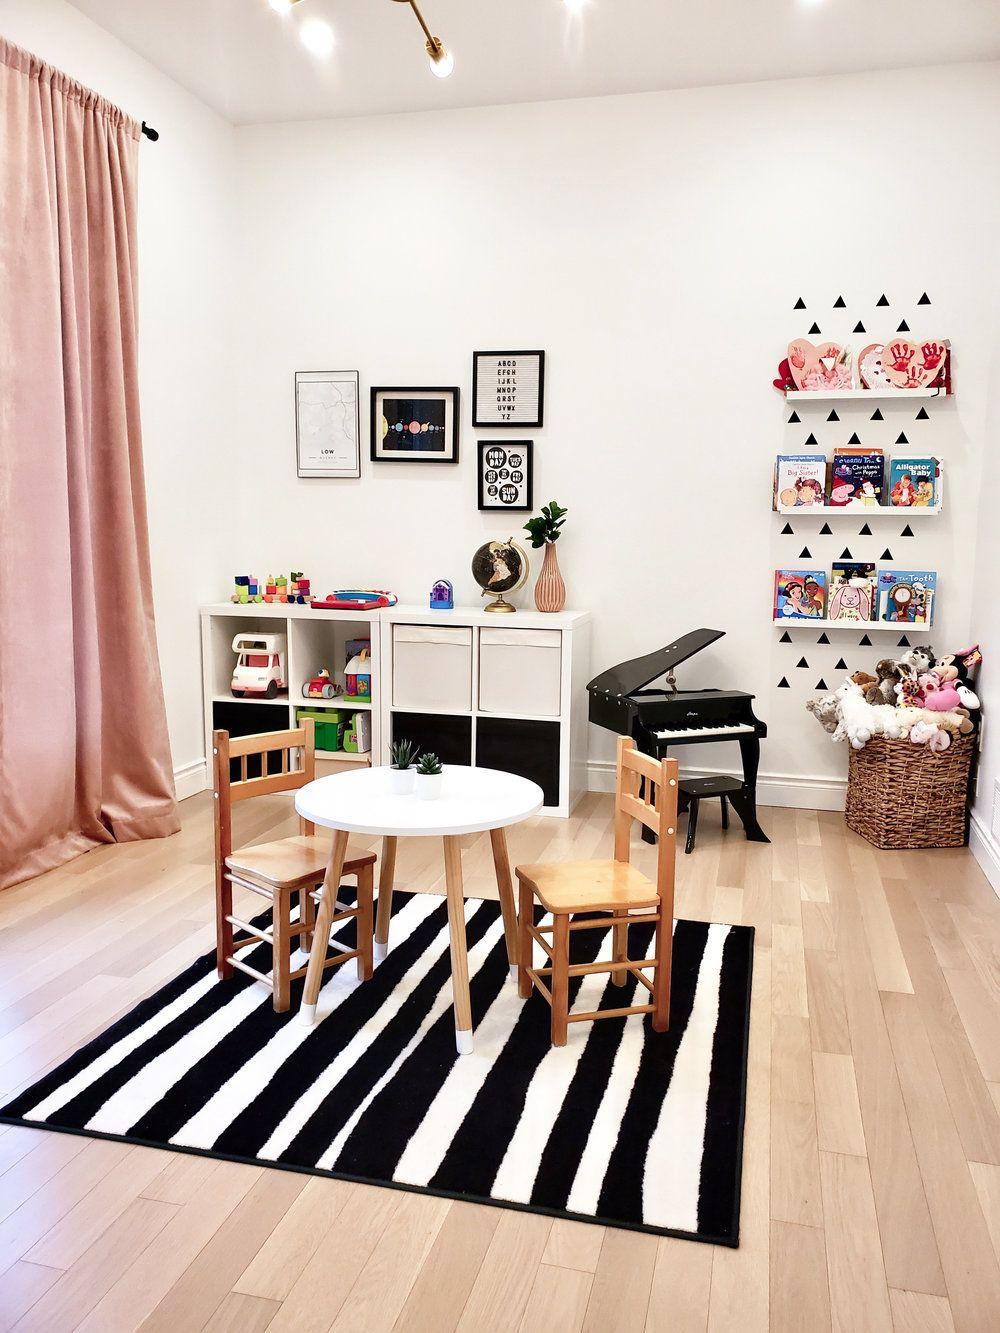 #playroom #decor #kids #kidsdecor #home